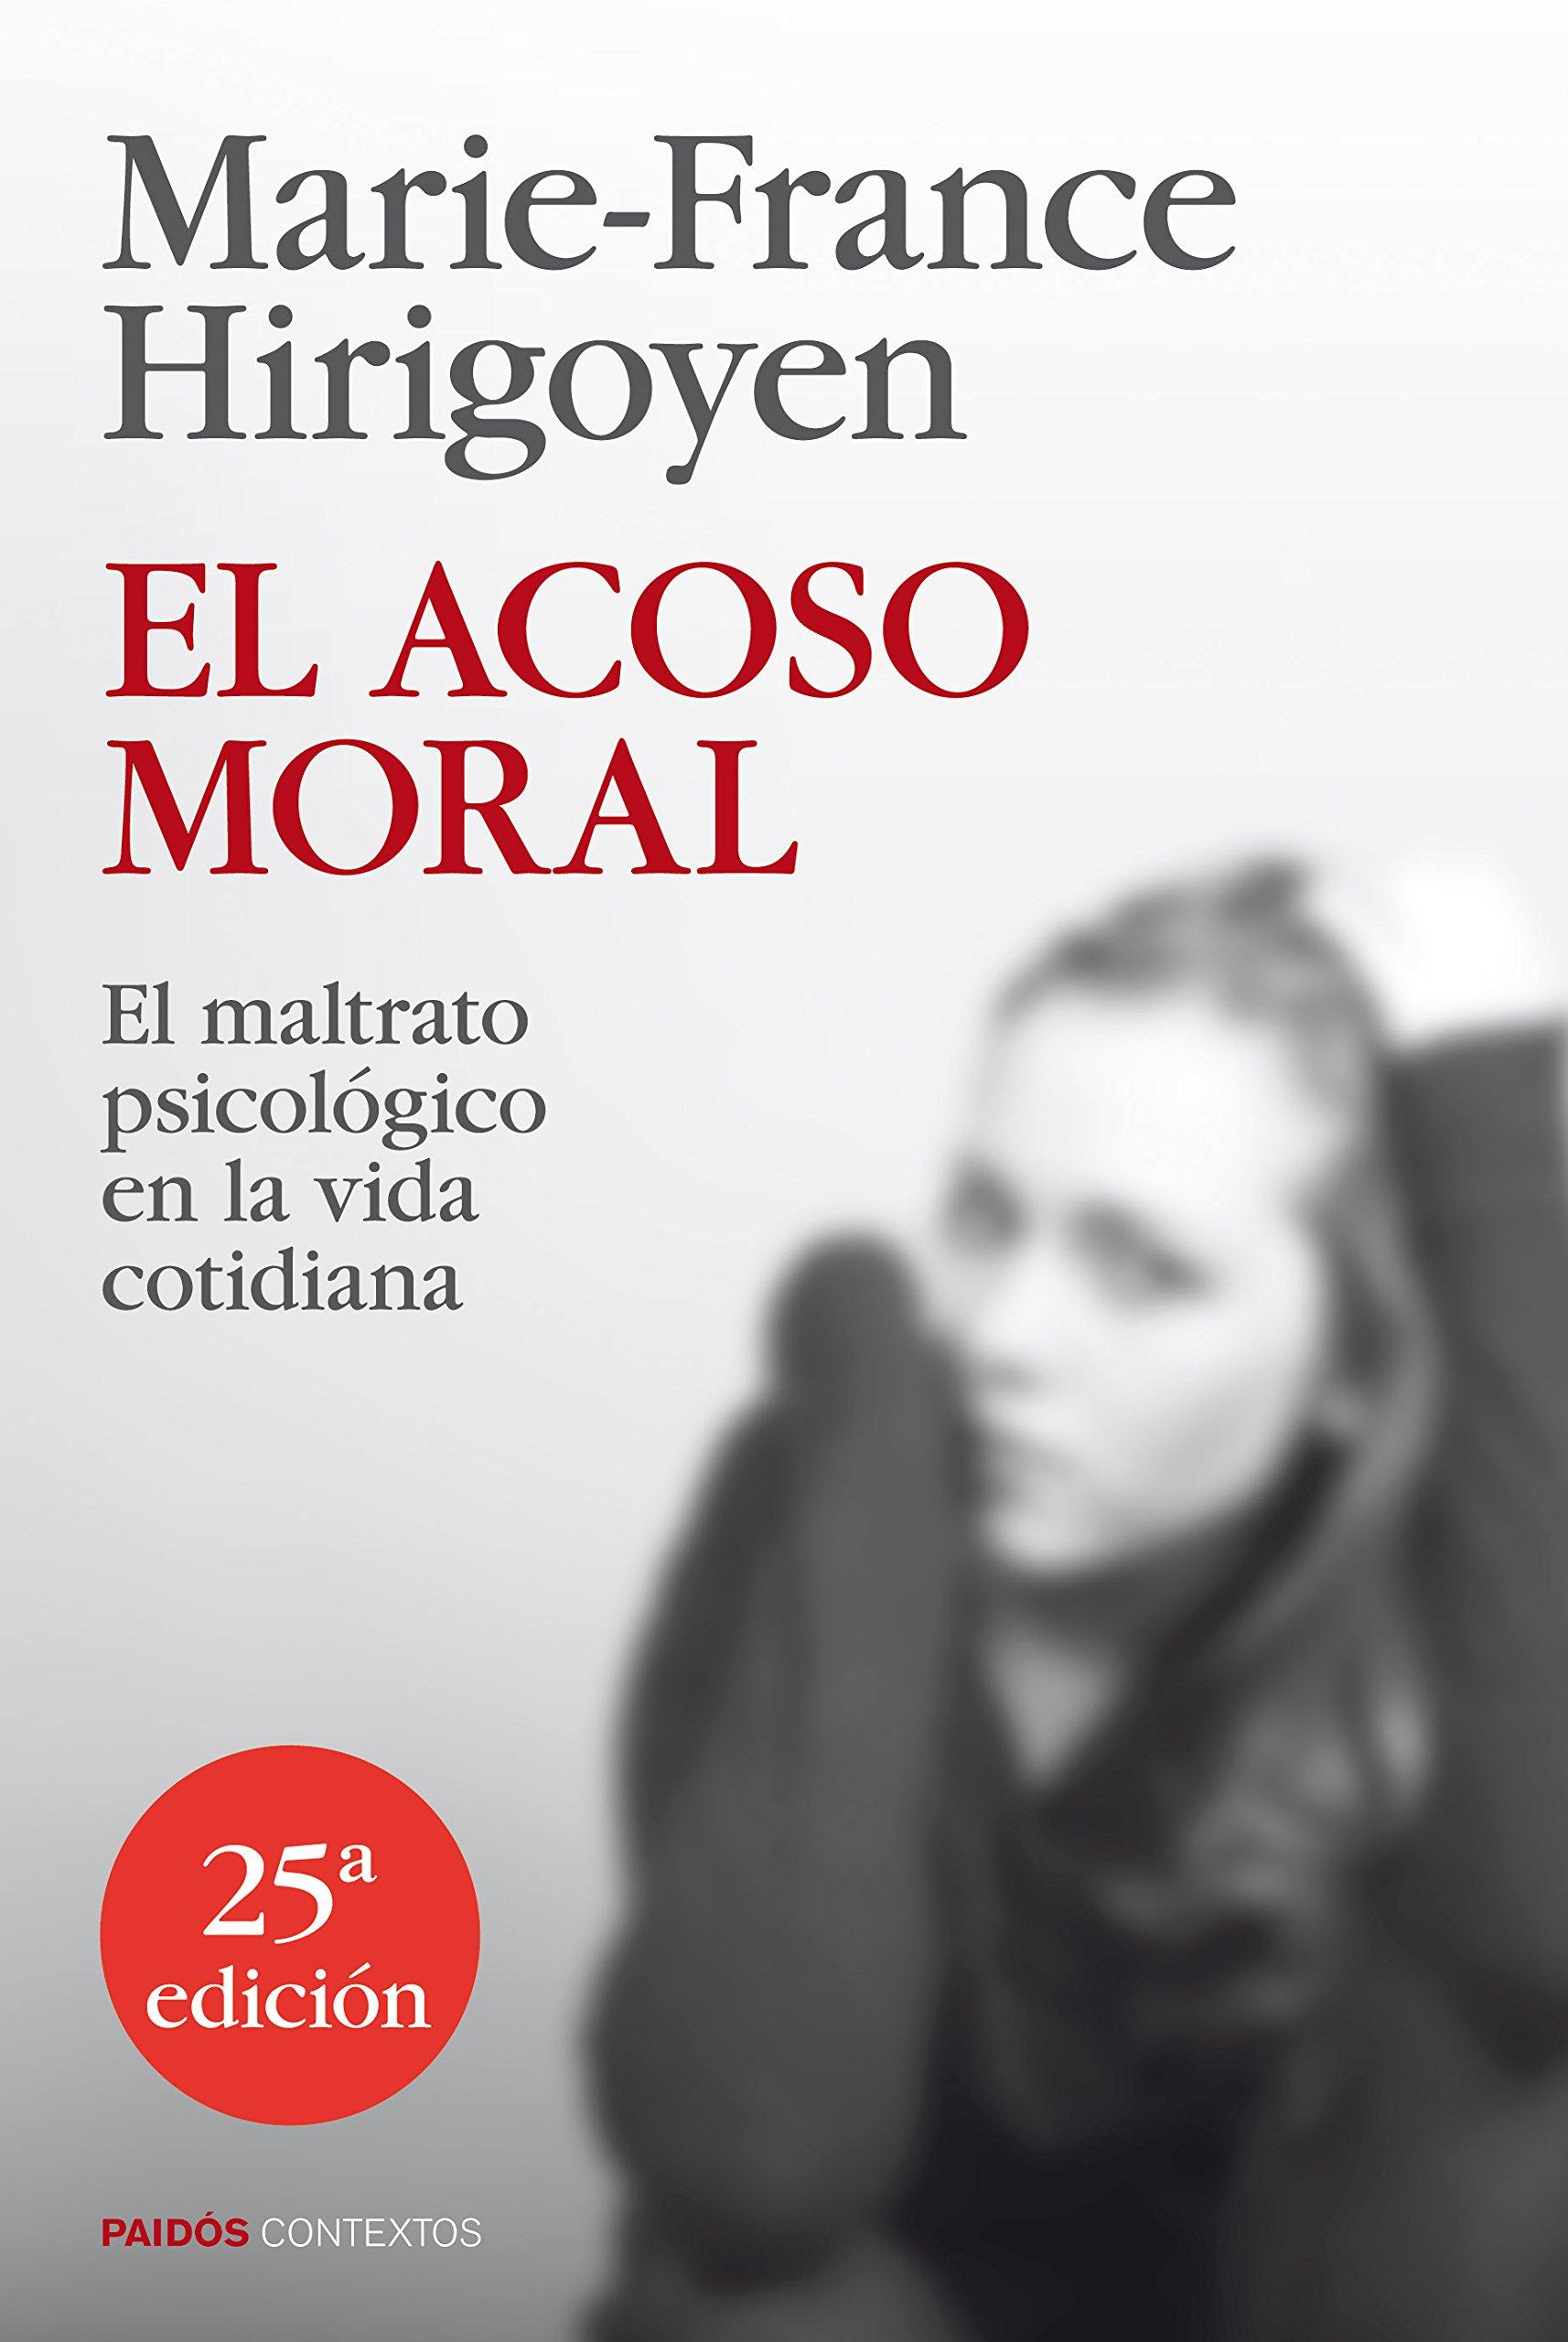 Acoso moral marie france hirigoyen ePub download